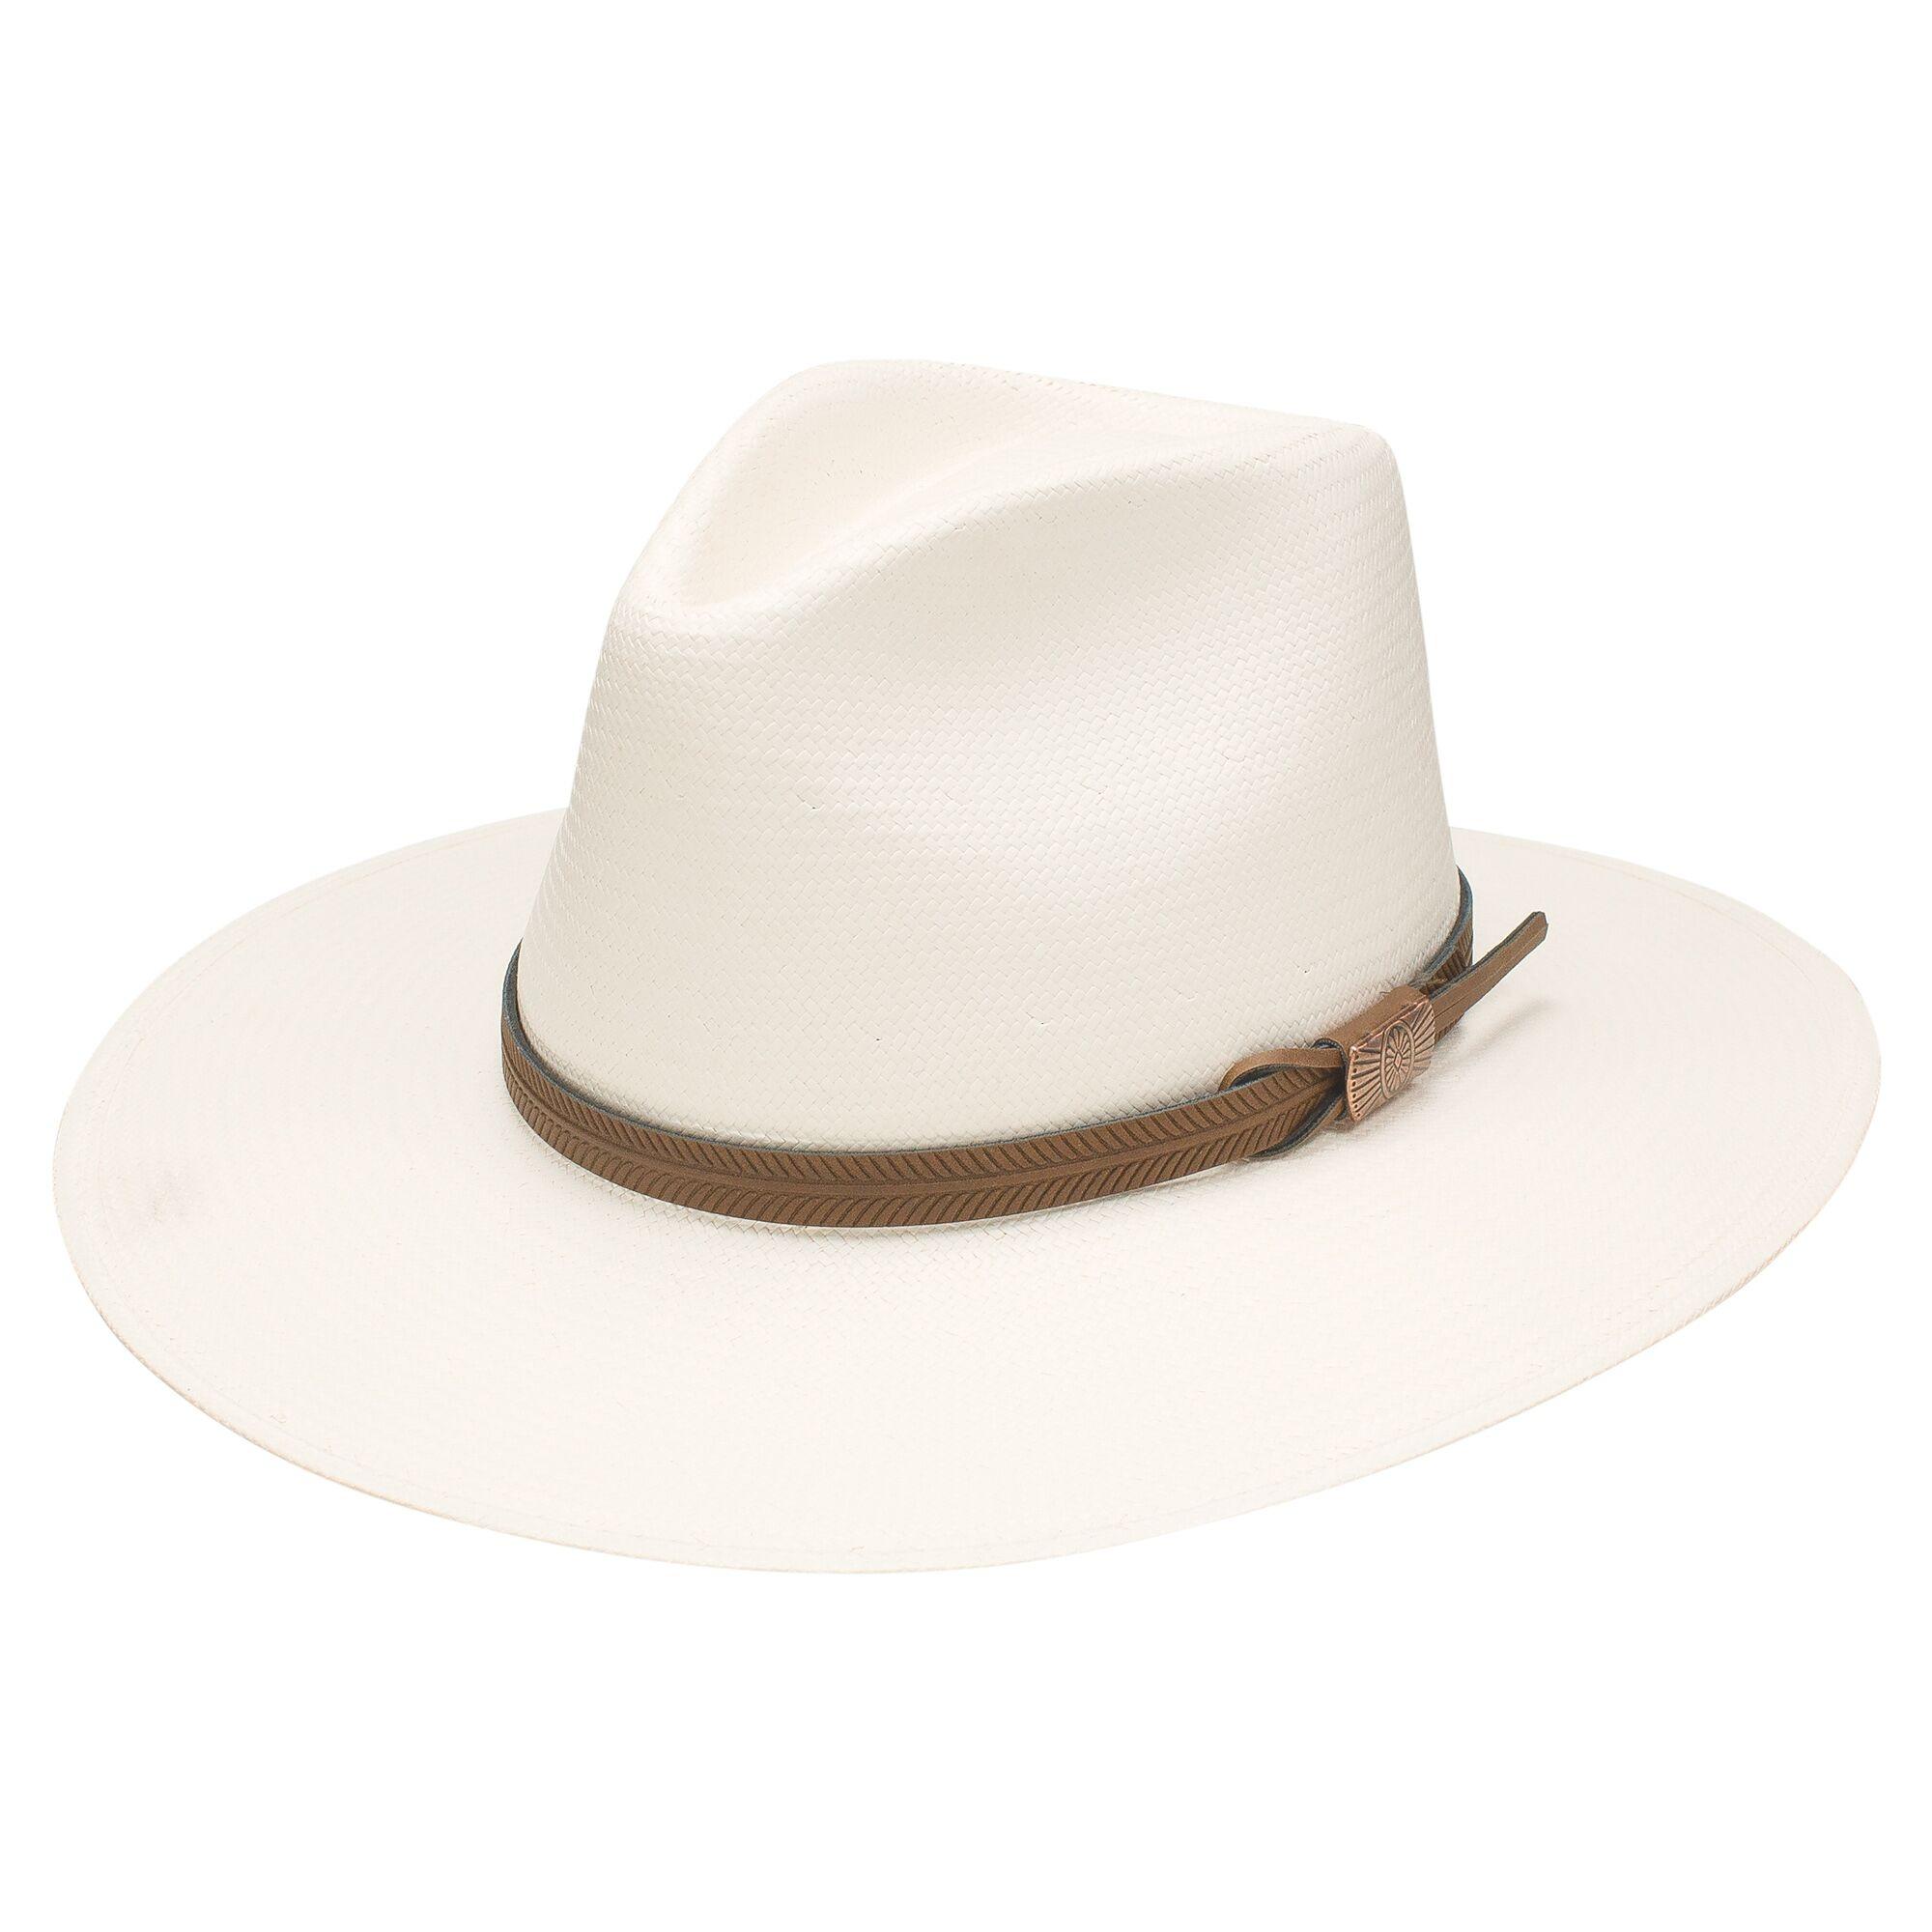 Stetson Stargazer - Straw Cowboy Hat